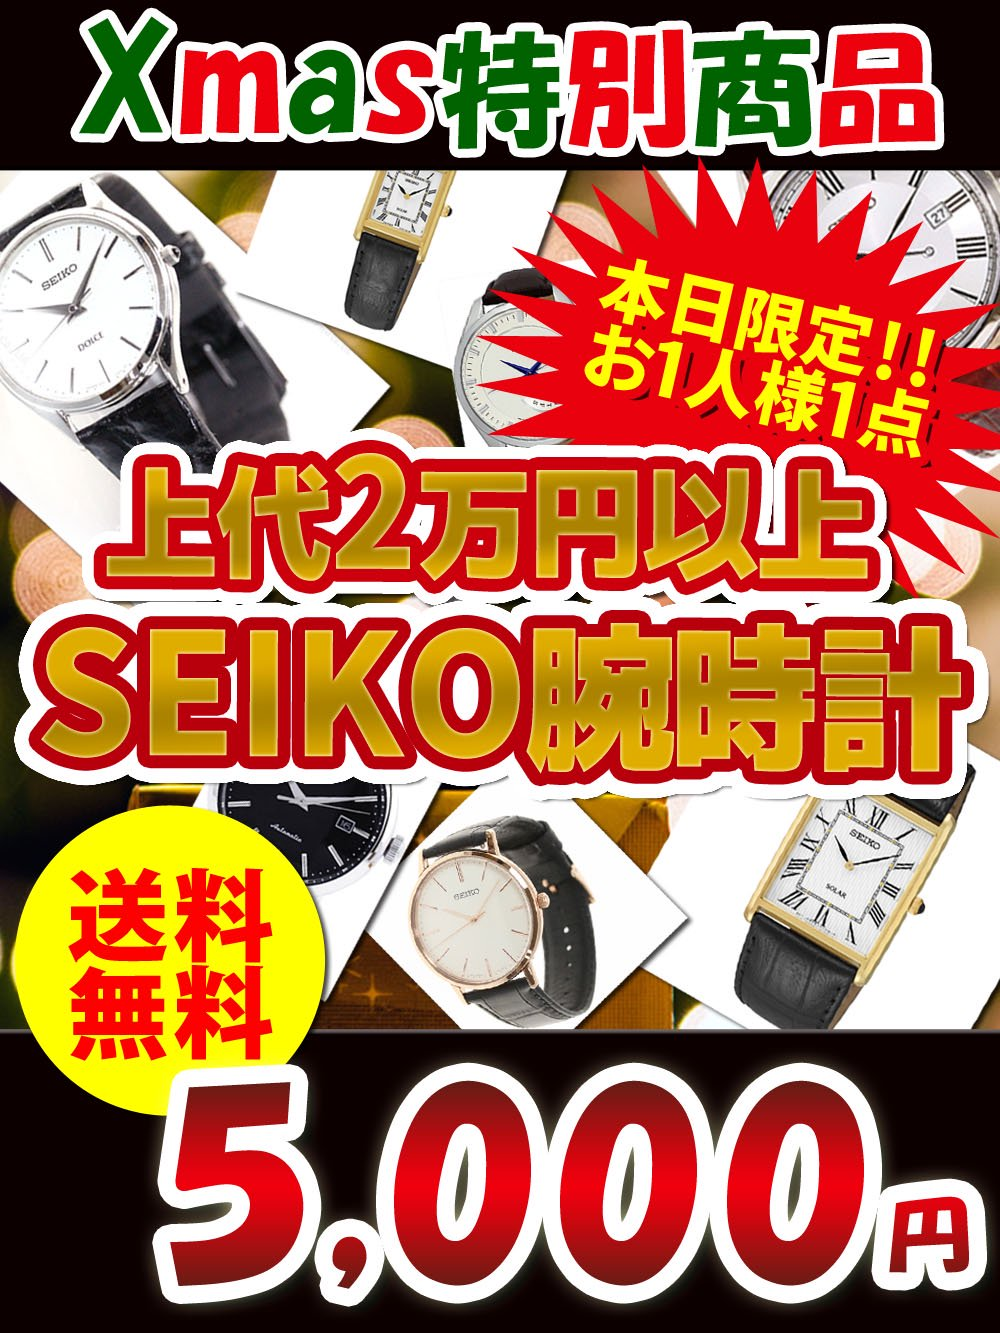 【定価2万以上!SEIKO人気腕時計】Xmas限定販売!送料無料5000円※お1人様1点限り